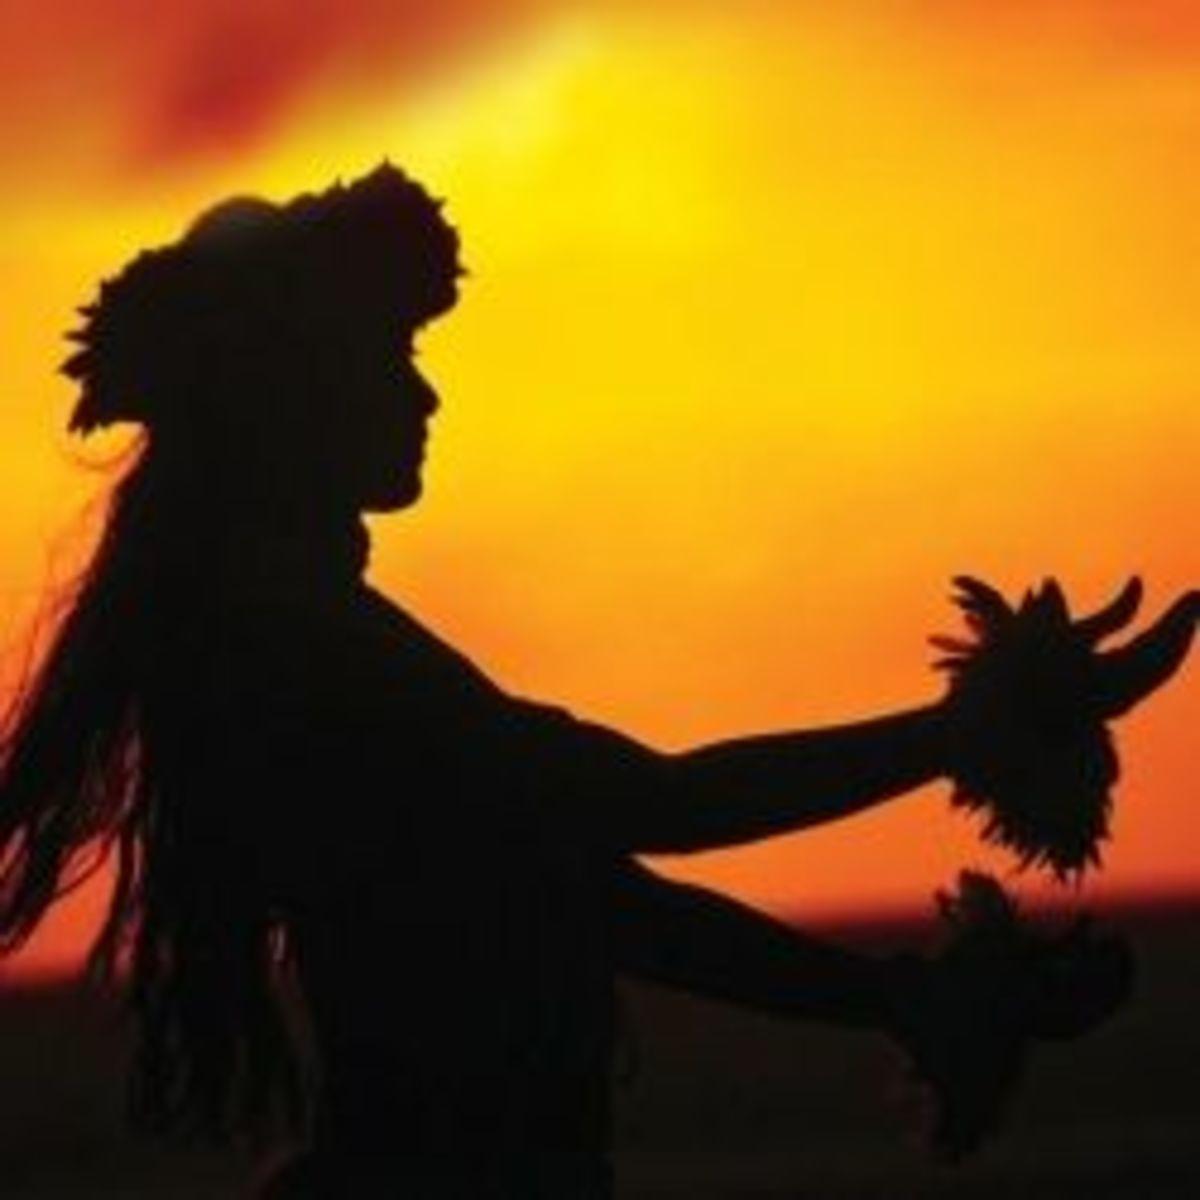 Image credit: http://www.villadeayora.com/blog/the-island-of-hawaii-paradise-surf/